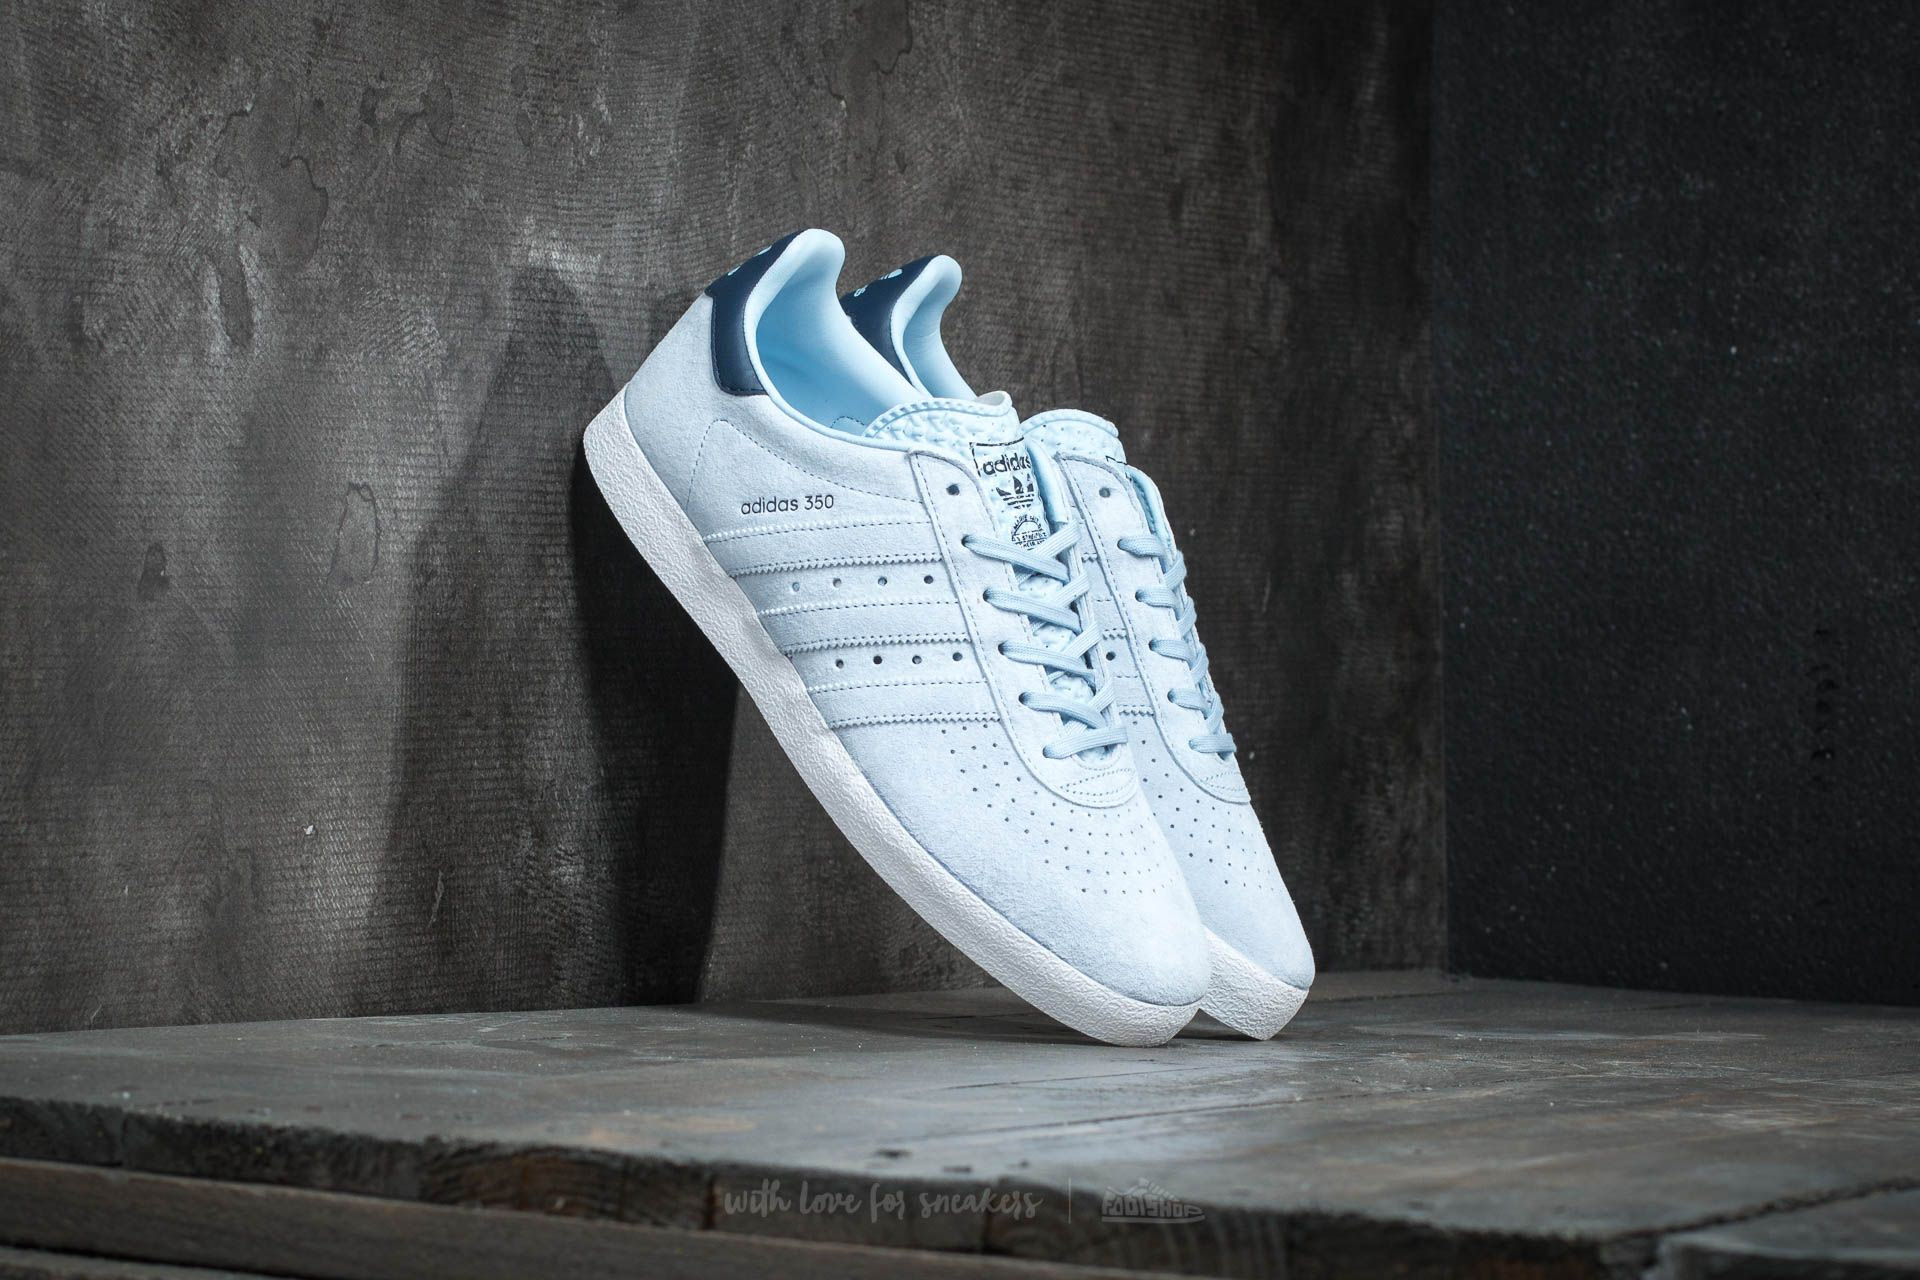 adidas 350 Easy Blue/ Easy Blue/ Collegiate Navy - 15840